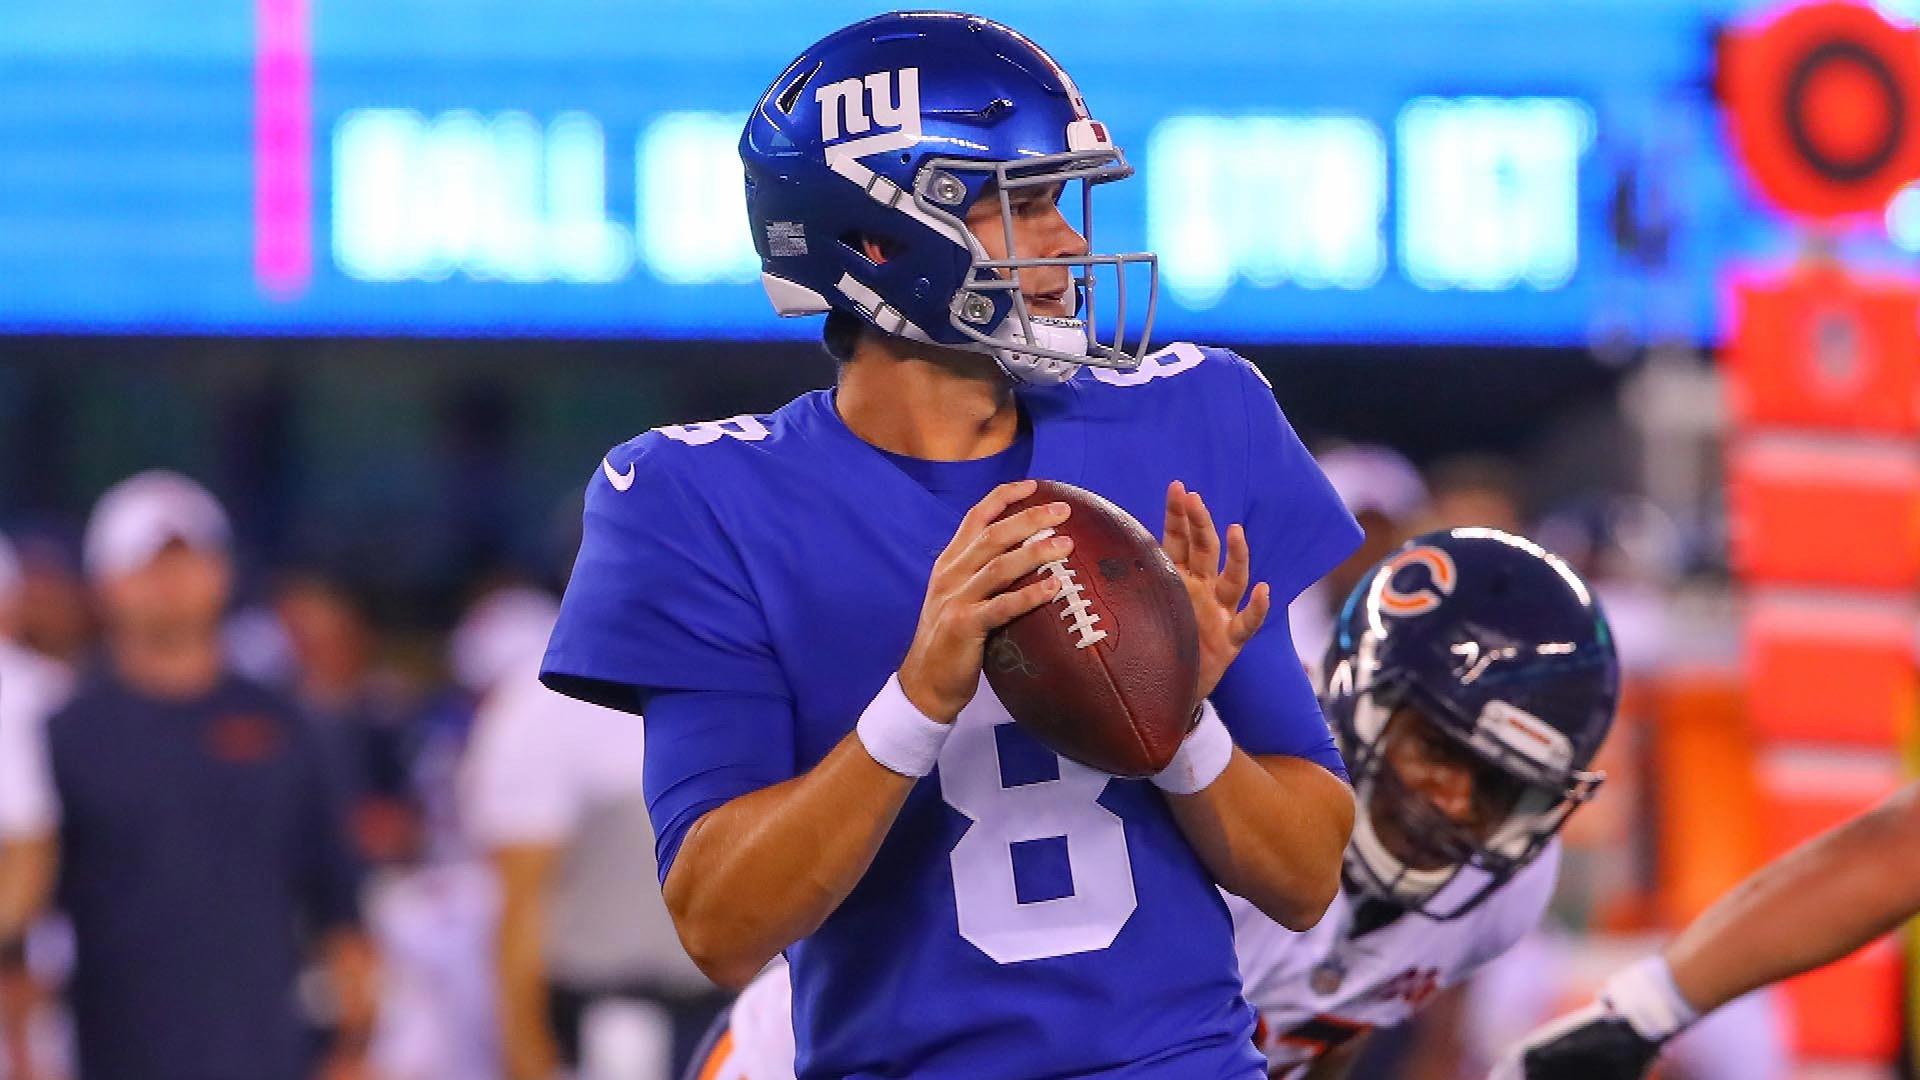 New York Giants' Daniel Jones continues to impress in 2019 preseason